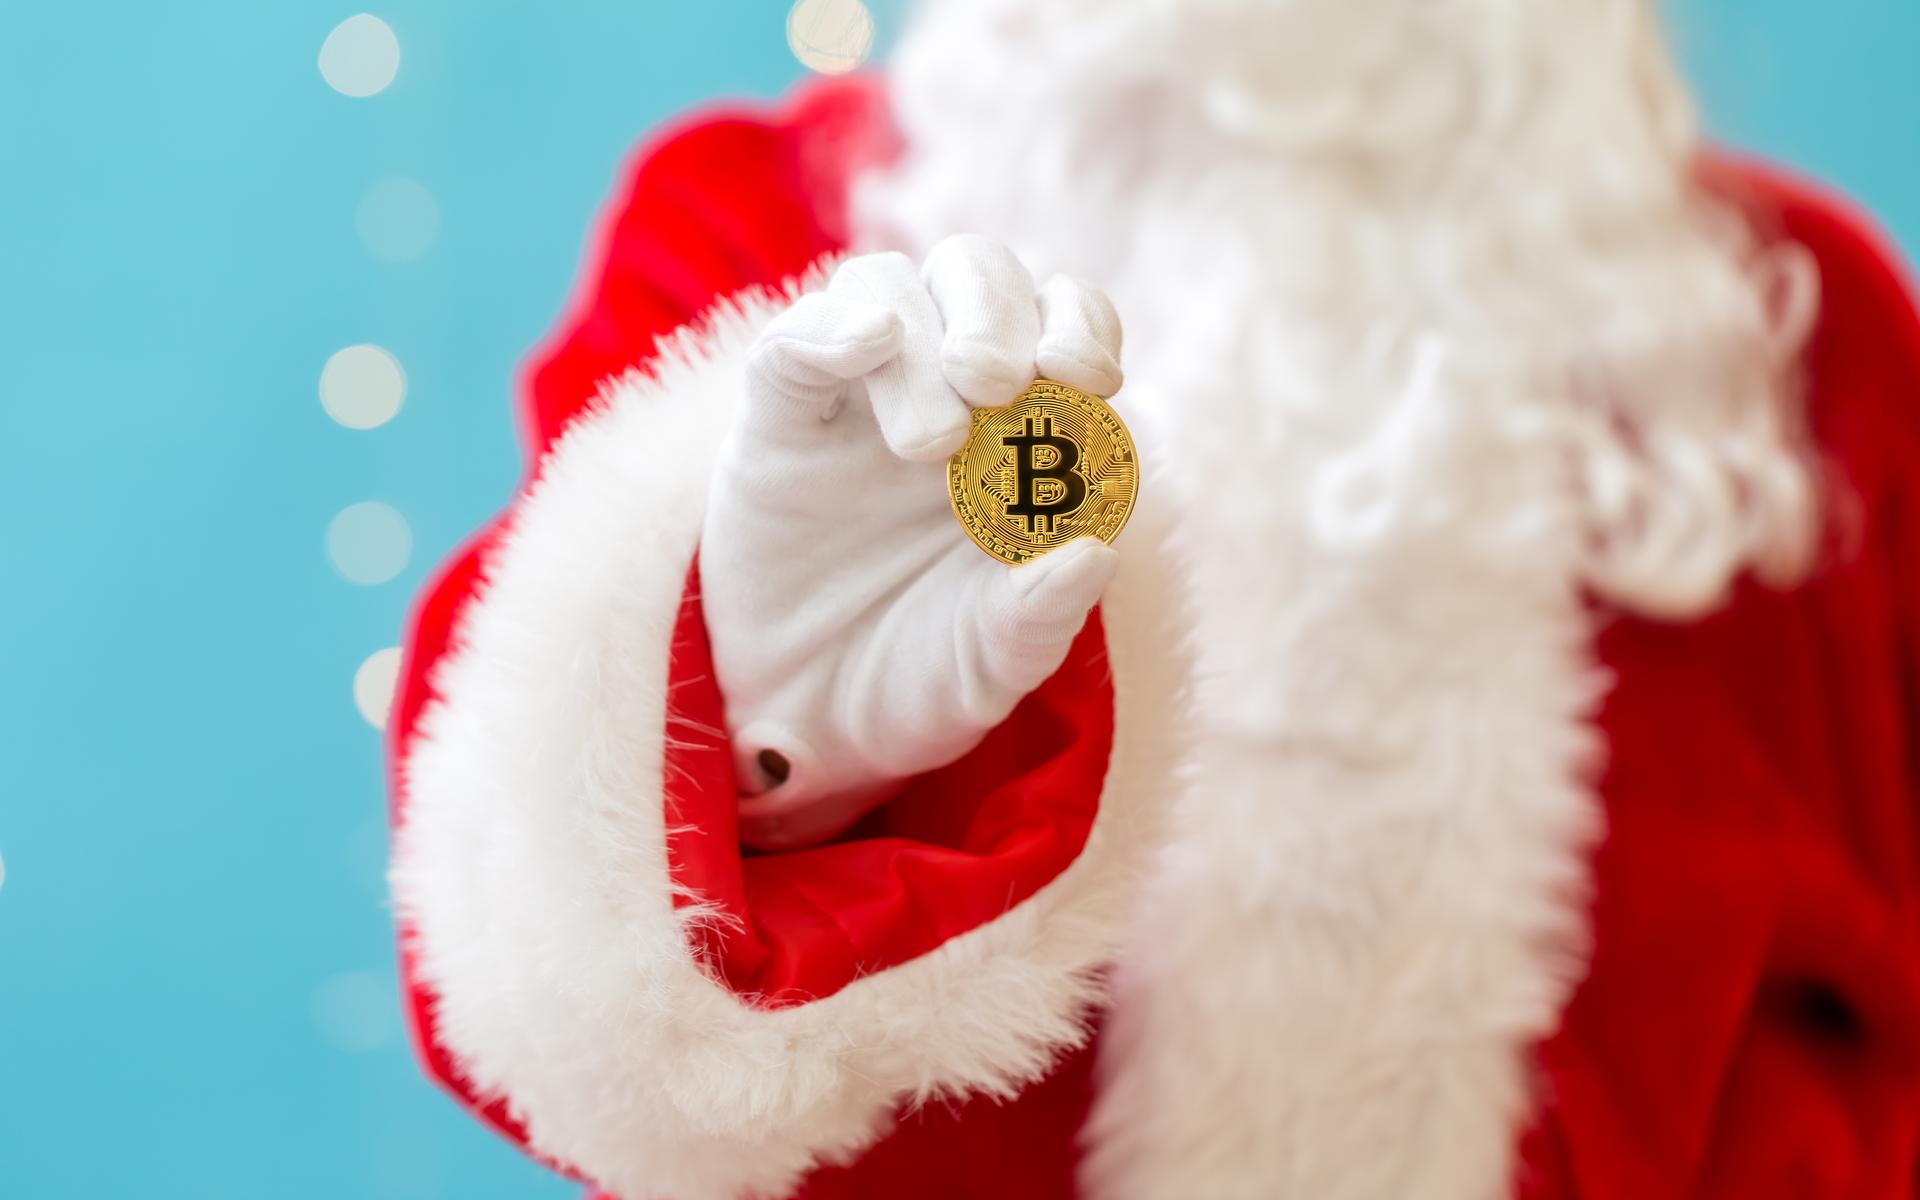 santa rally bitcoin price cryptocurrency